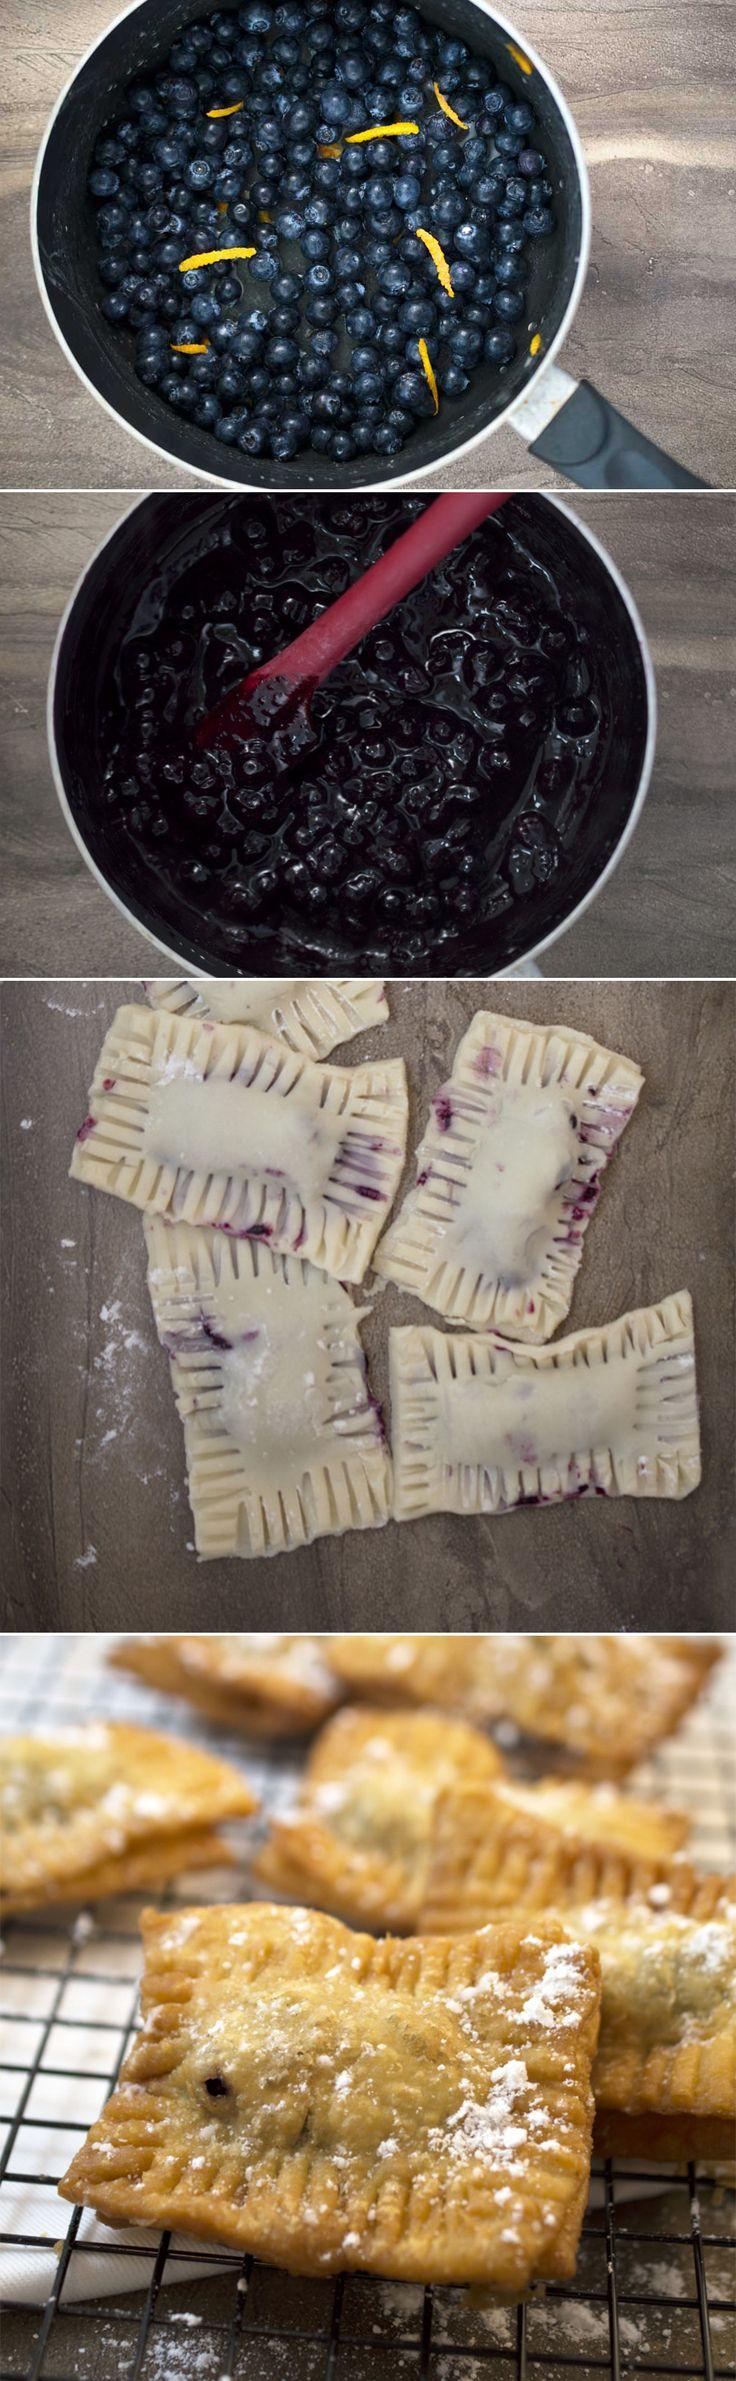 Homemade blueberry pie pockets by chefsavvy.com. Made with a fresh homemade blueberry sauce. #recipe #dessert #blueberry